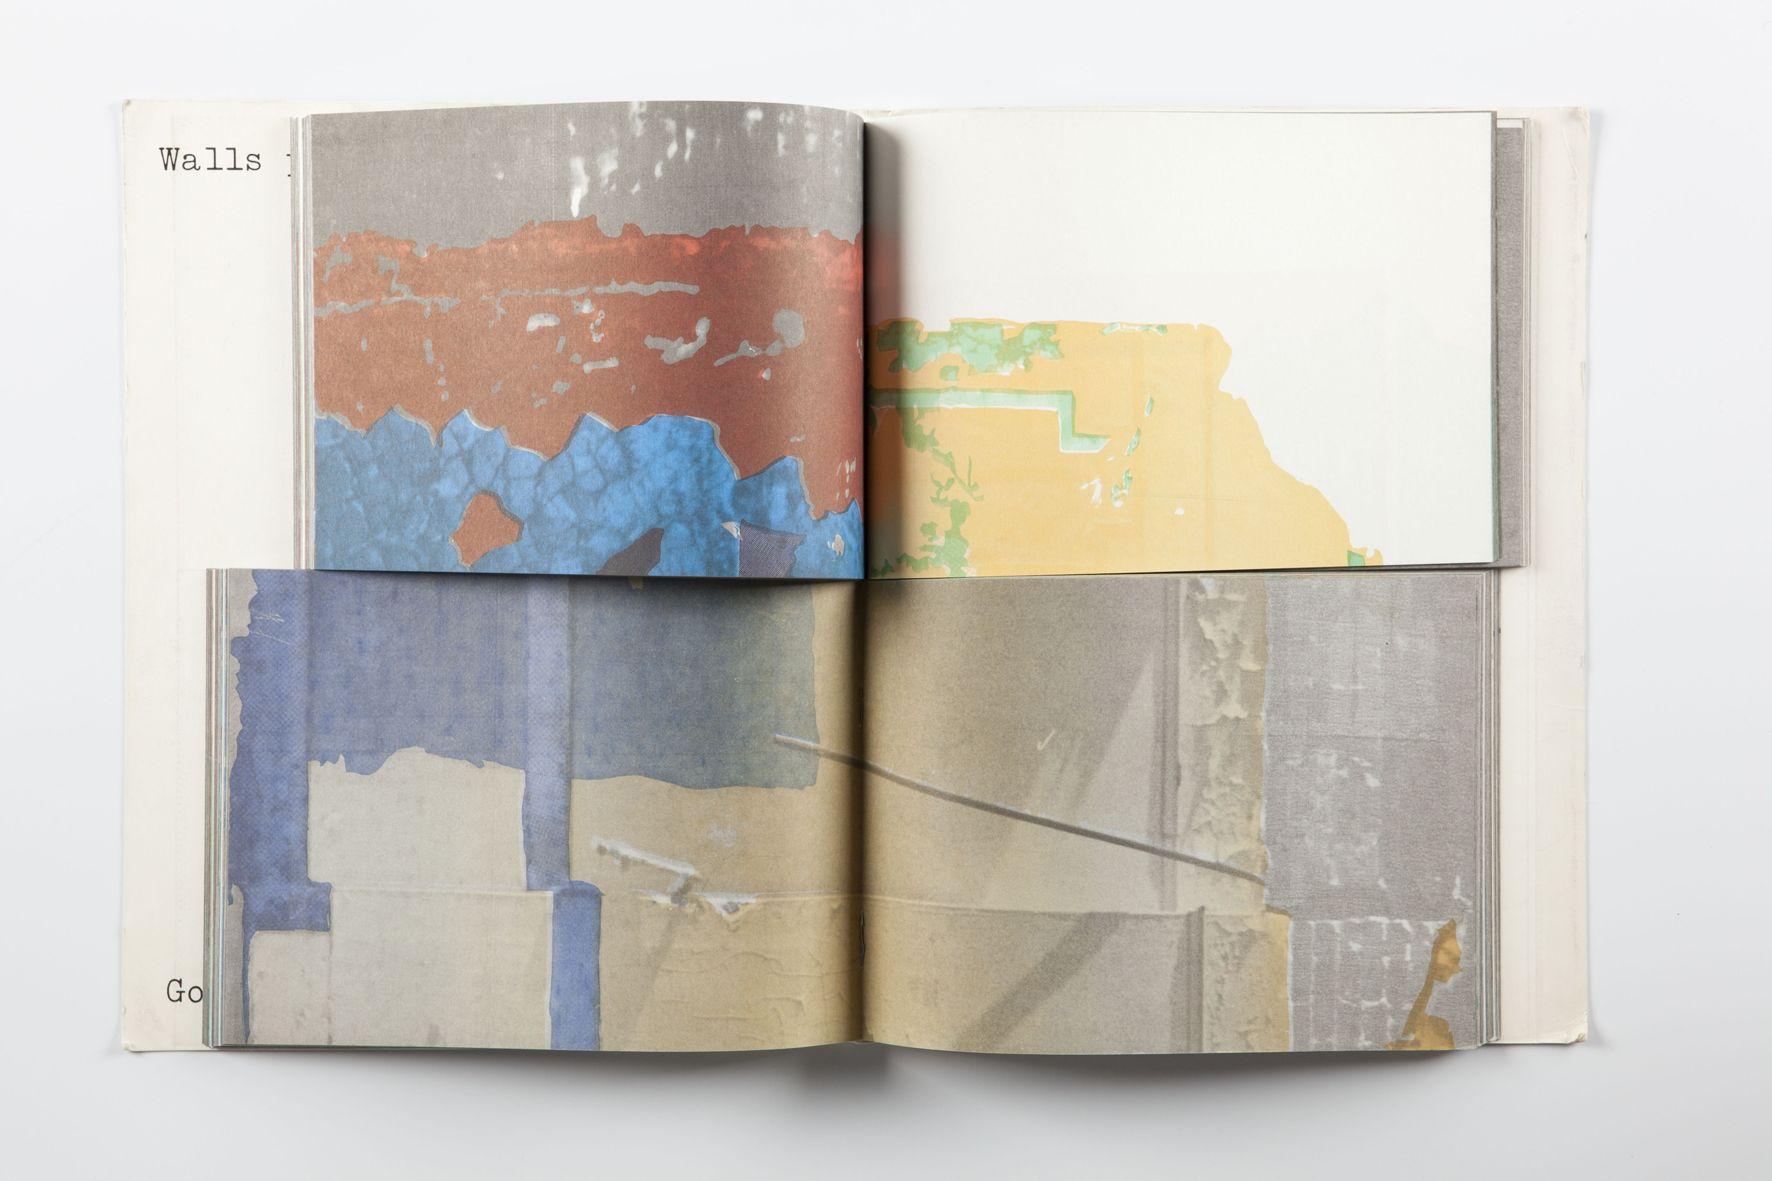 gordon matta-clark, walls paper (1973)